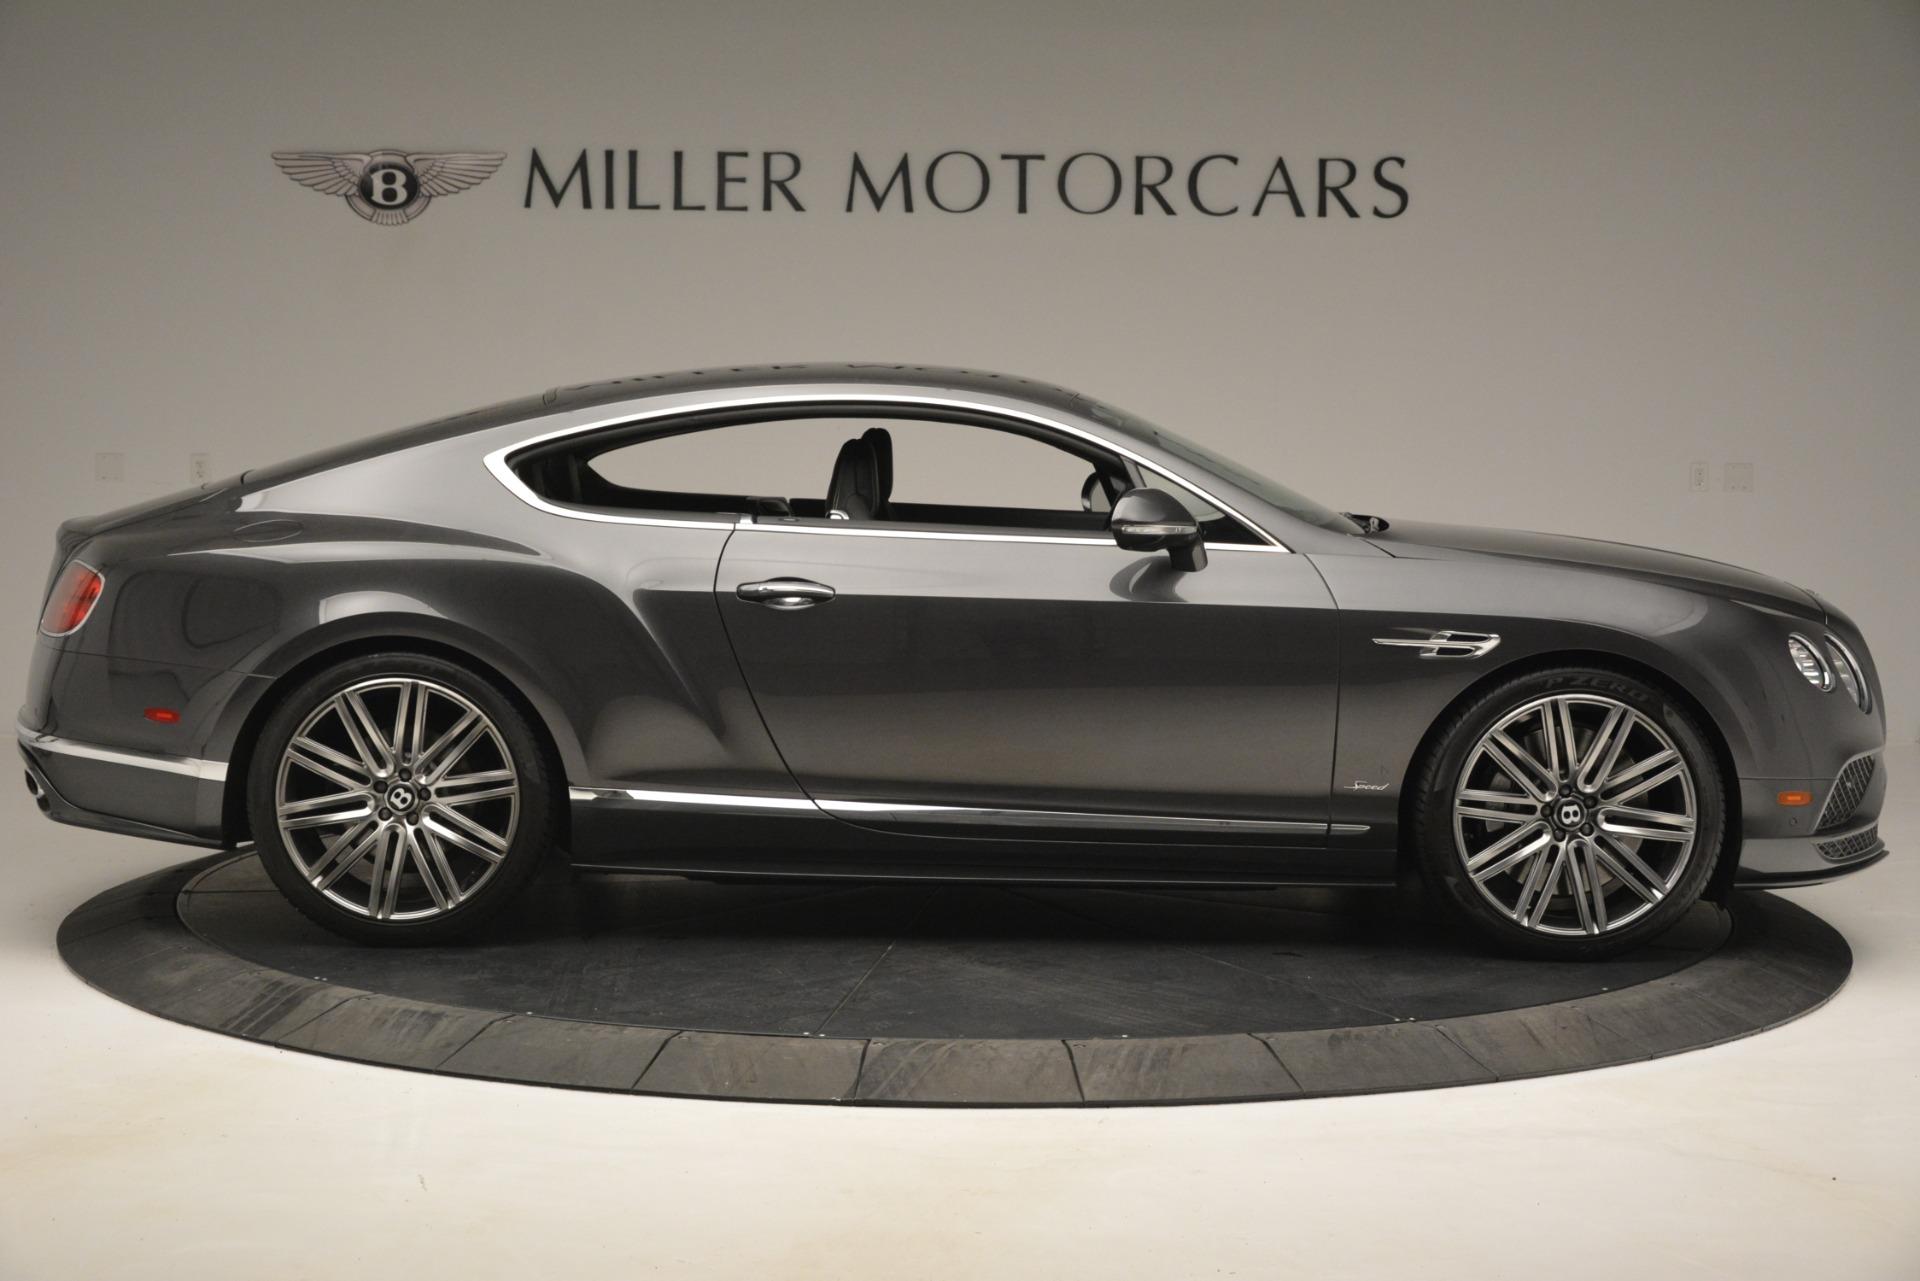 Used 2016 Bentley Continental GT Speed For Sale In Westport, CT 2953_p9